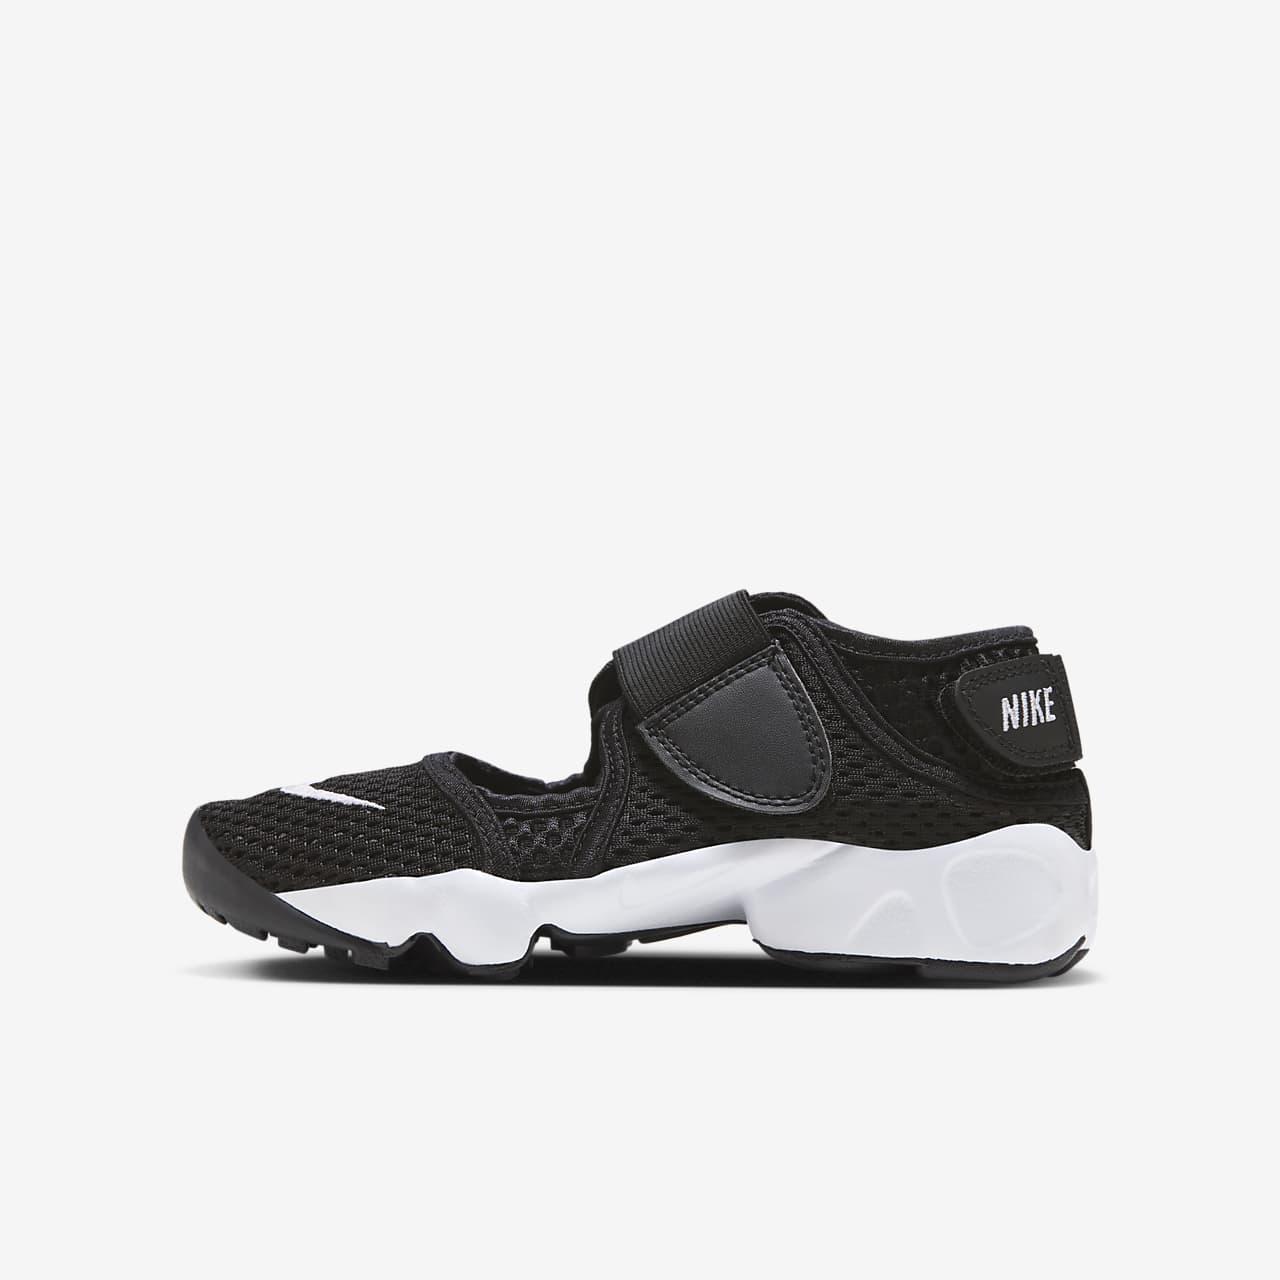 preschool nike air max 720 NIKE Official]Nike Air Rift (10.5c-3y) Preschool Kids' Shoe ...